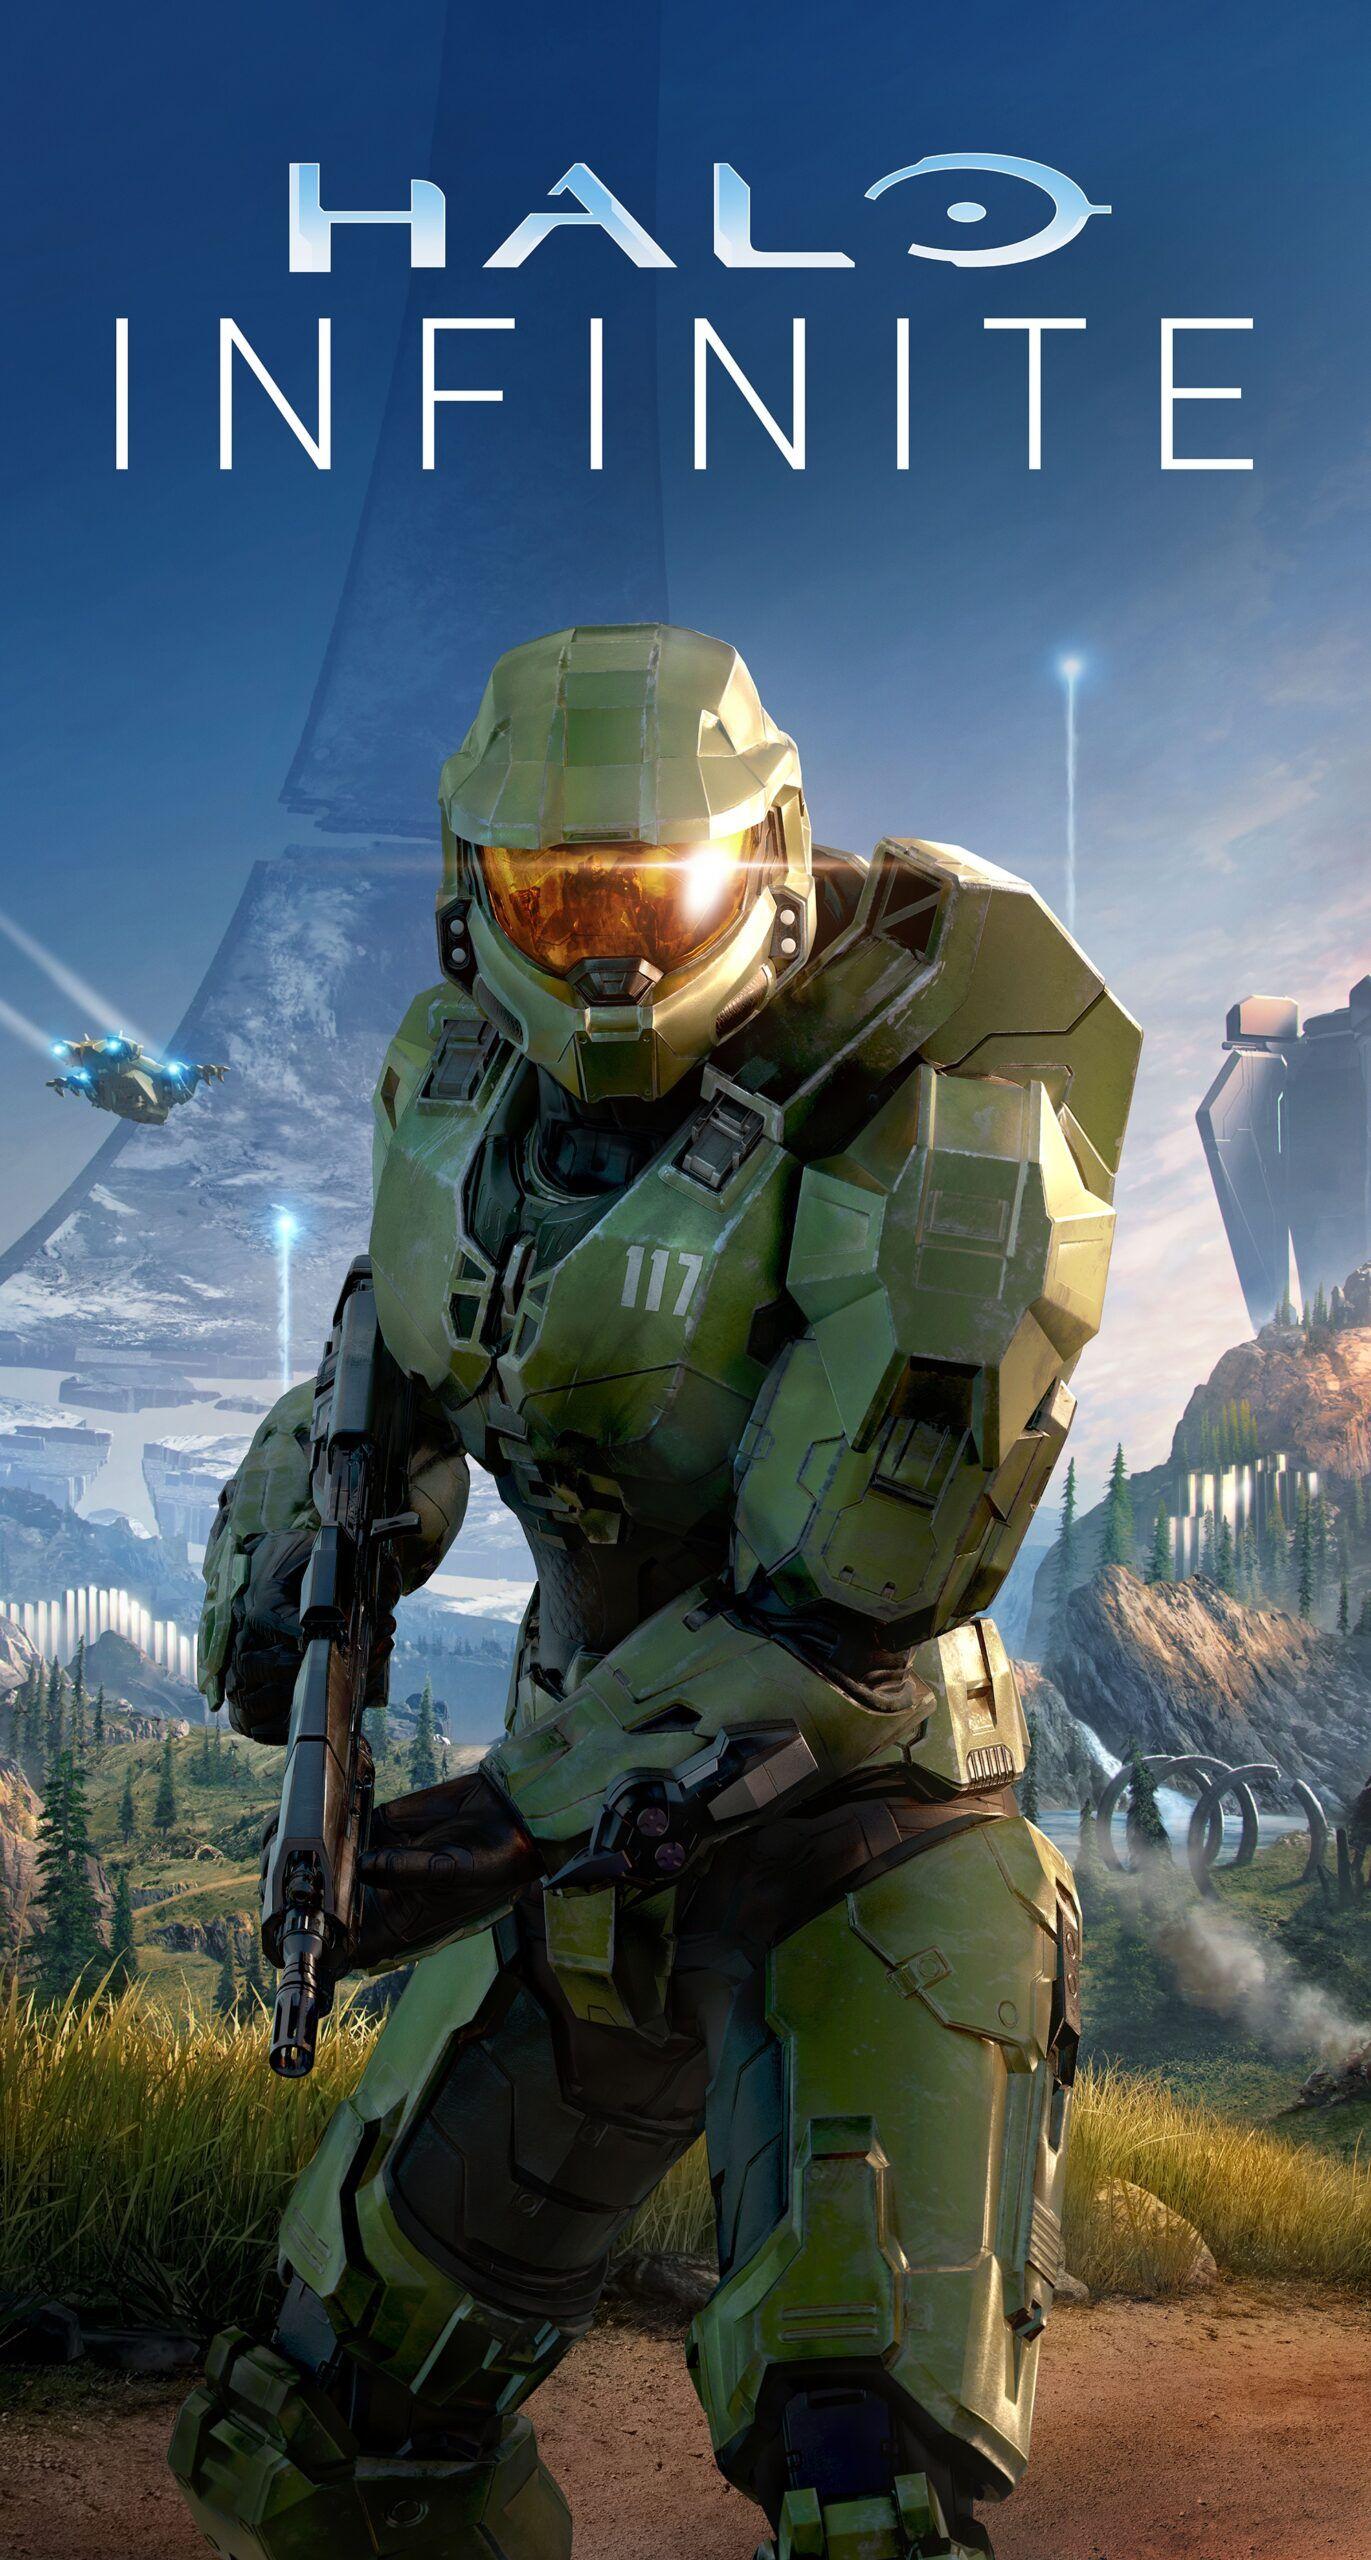 Halo Infinite Cover Art Puts The Spotlight On Master Chief In 2020 Halo Xbox Halo Spartan Halo